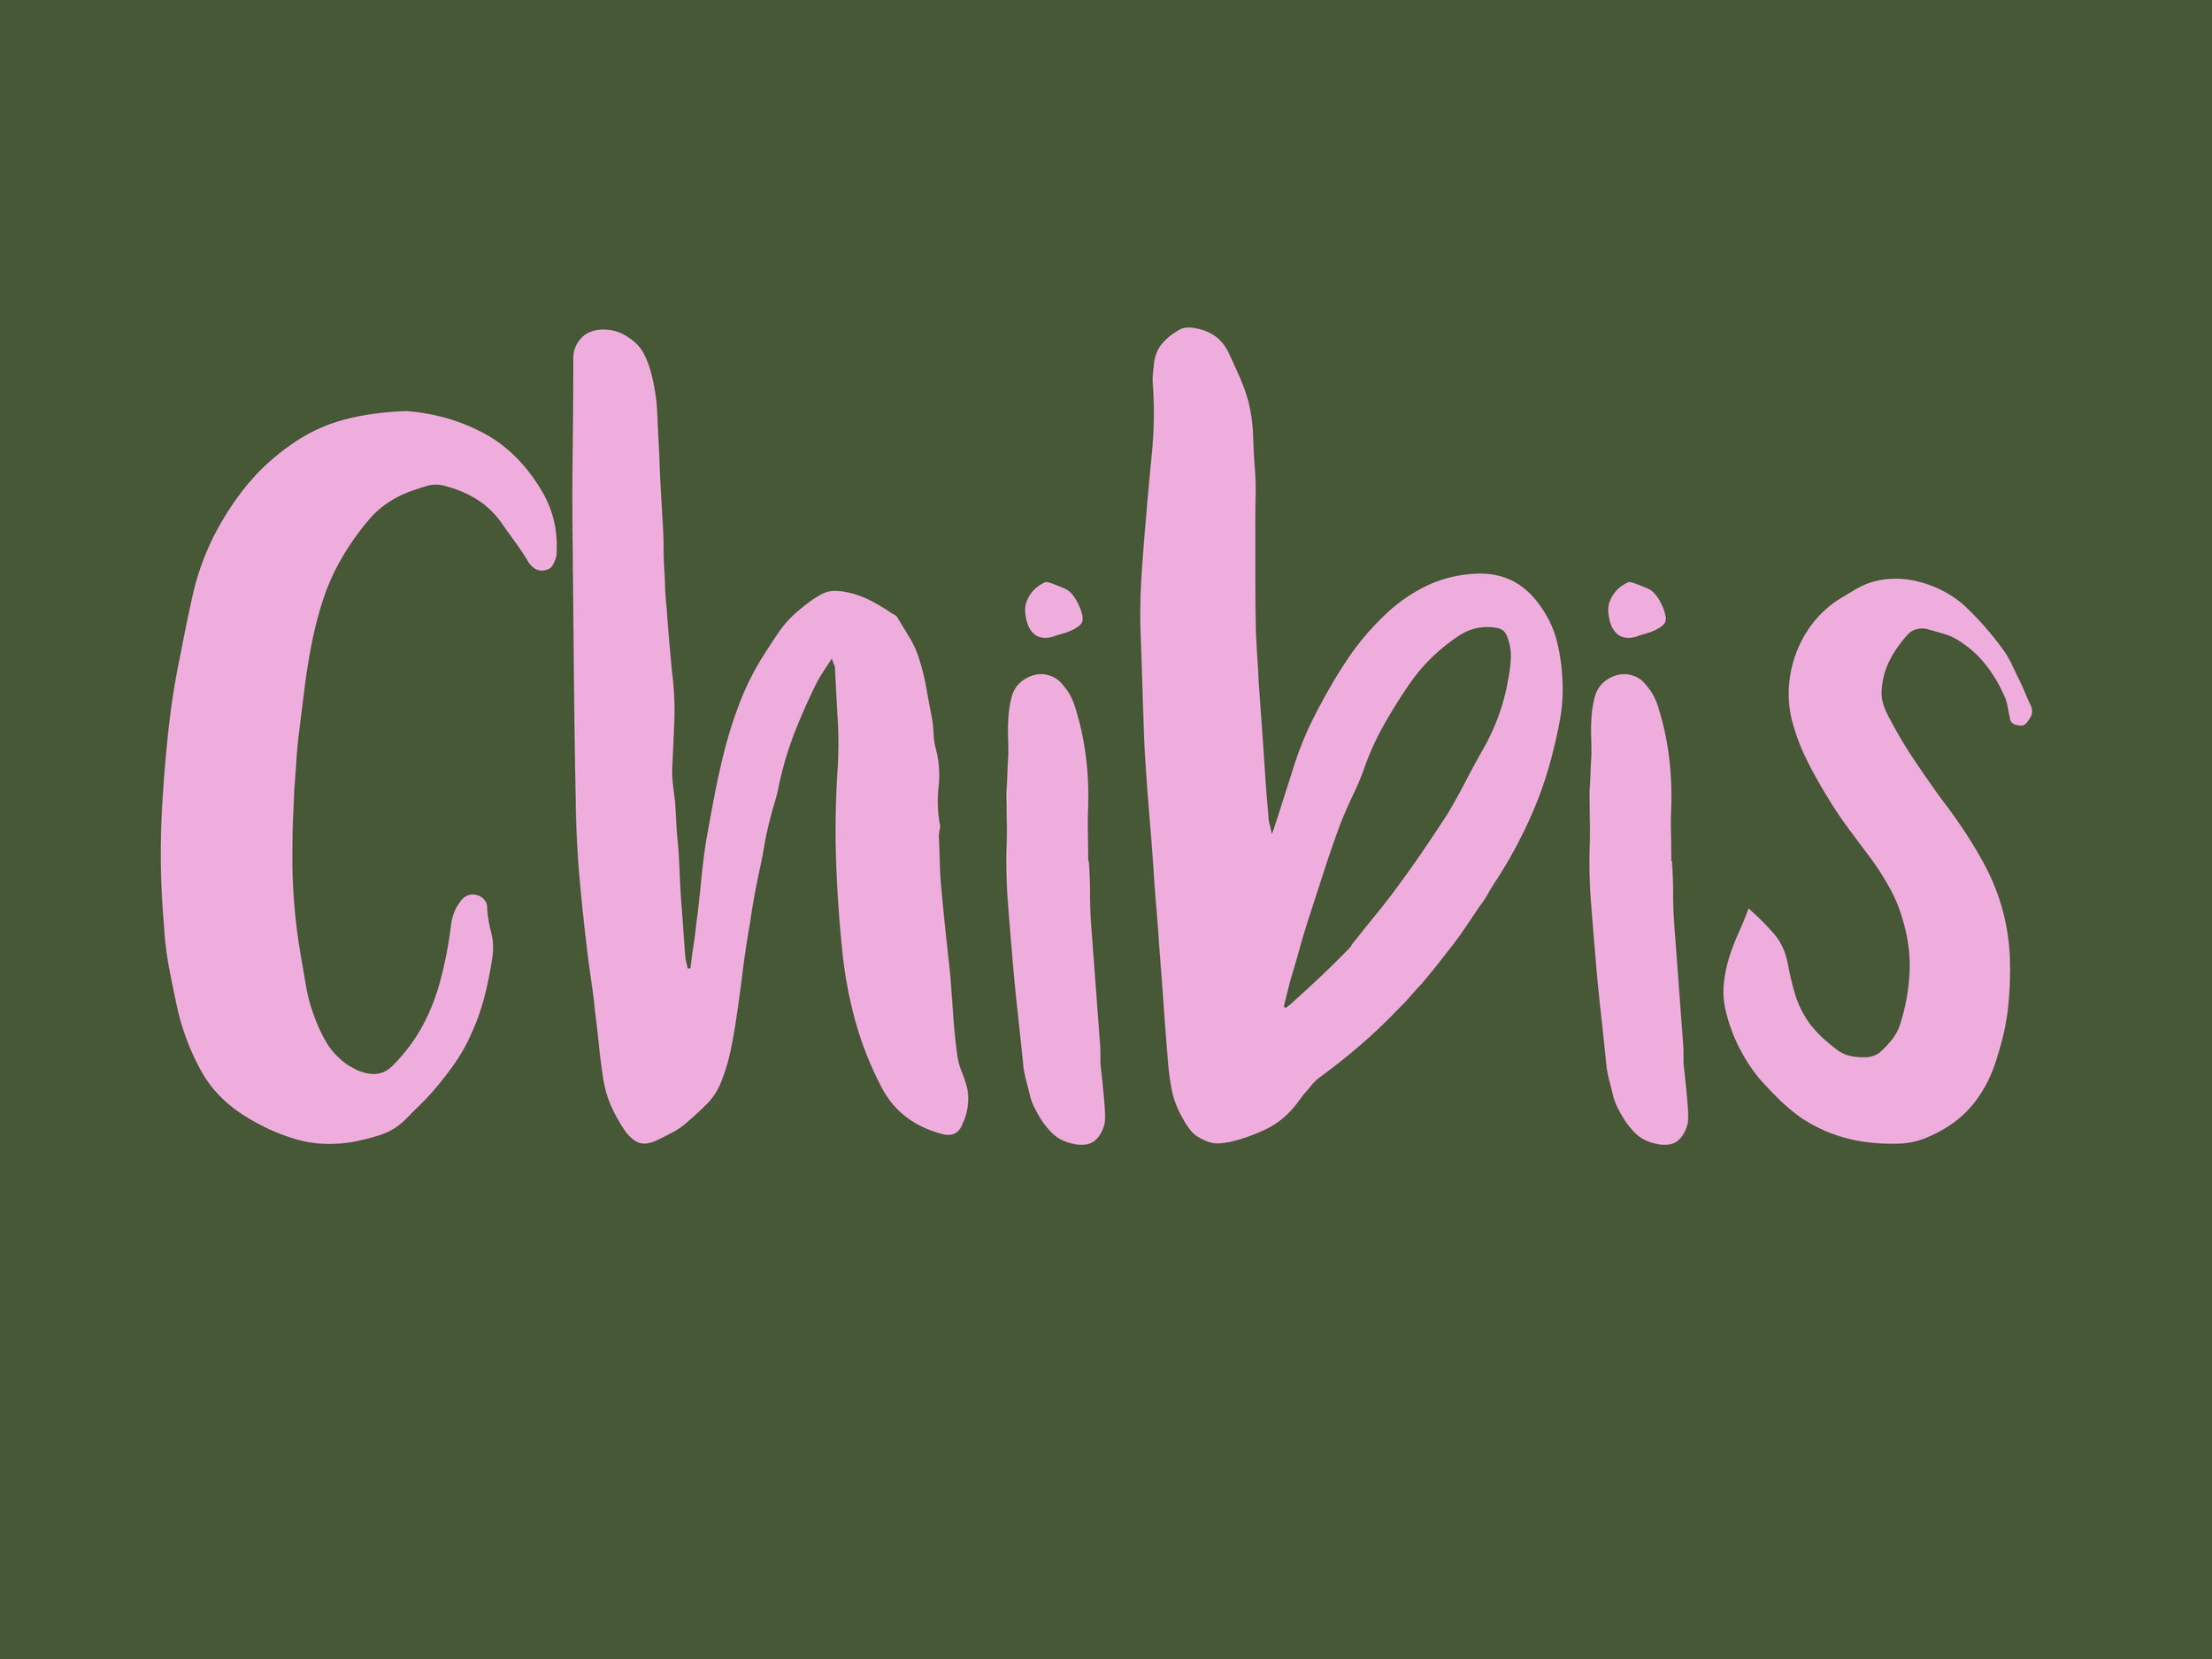 chibis.jpg